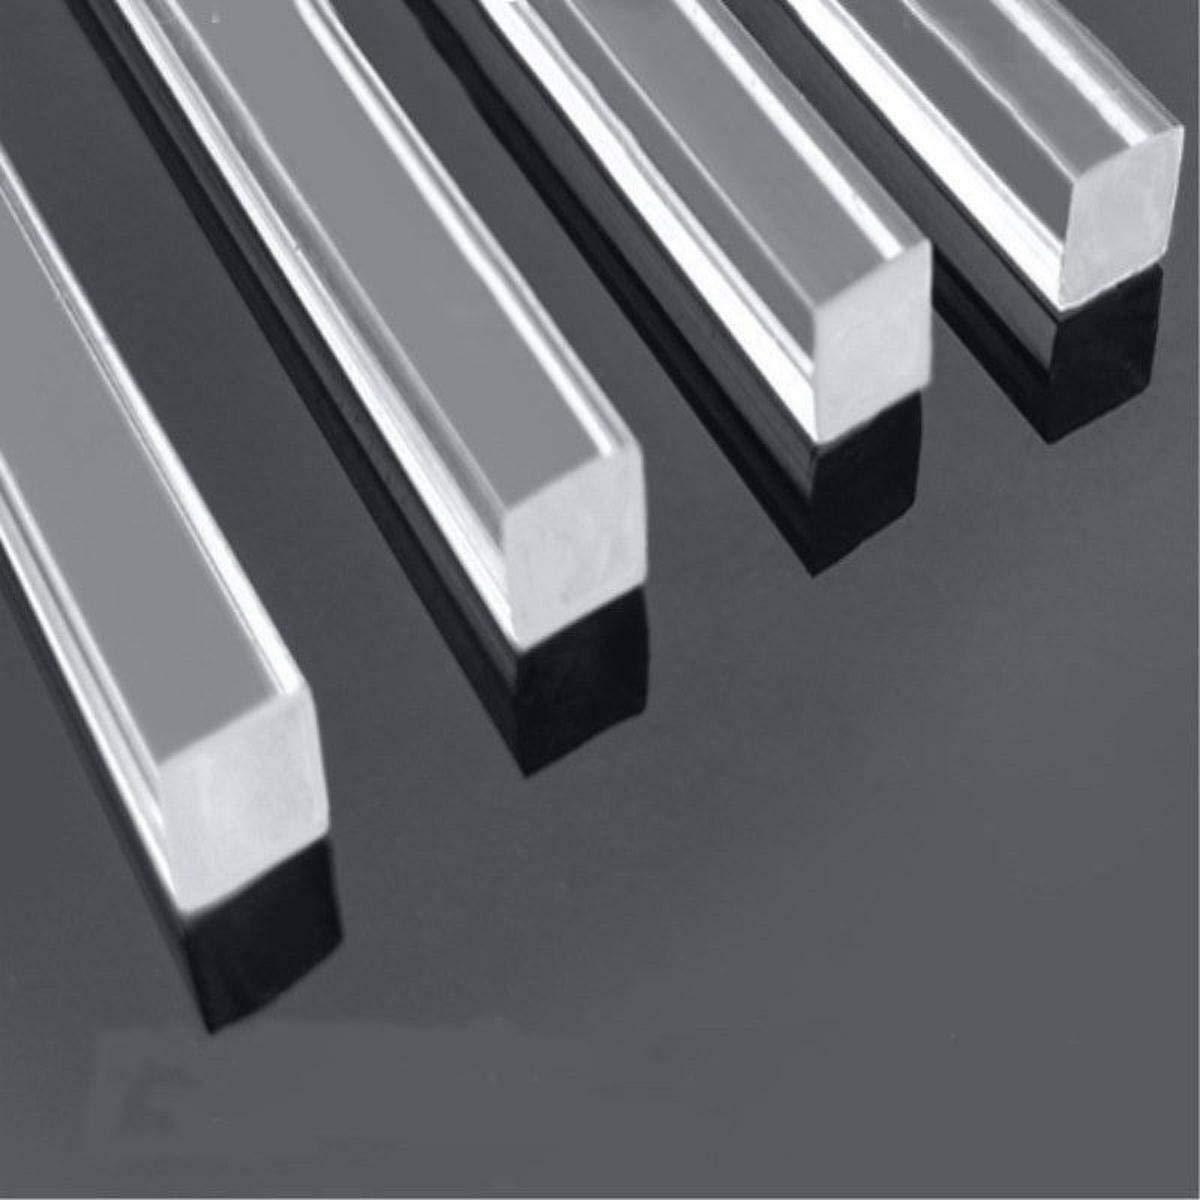 US Stock 48pcs Square Clear Acrylic Plexiglass Lucite Rod Bar 2 x 2mm 250mm Long